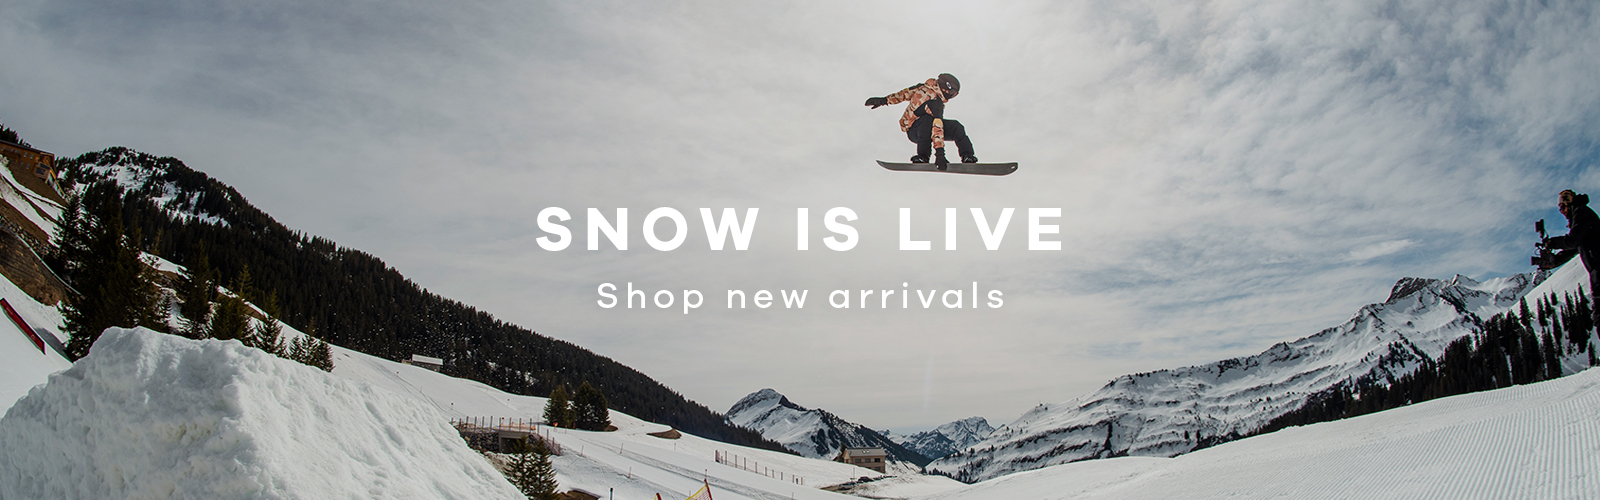 SNOW IS LIVE   Shop new arrivals